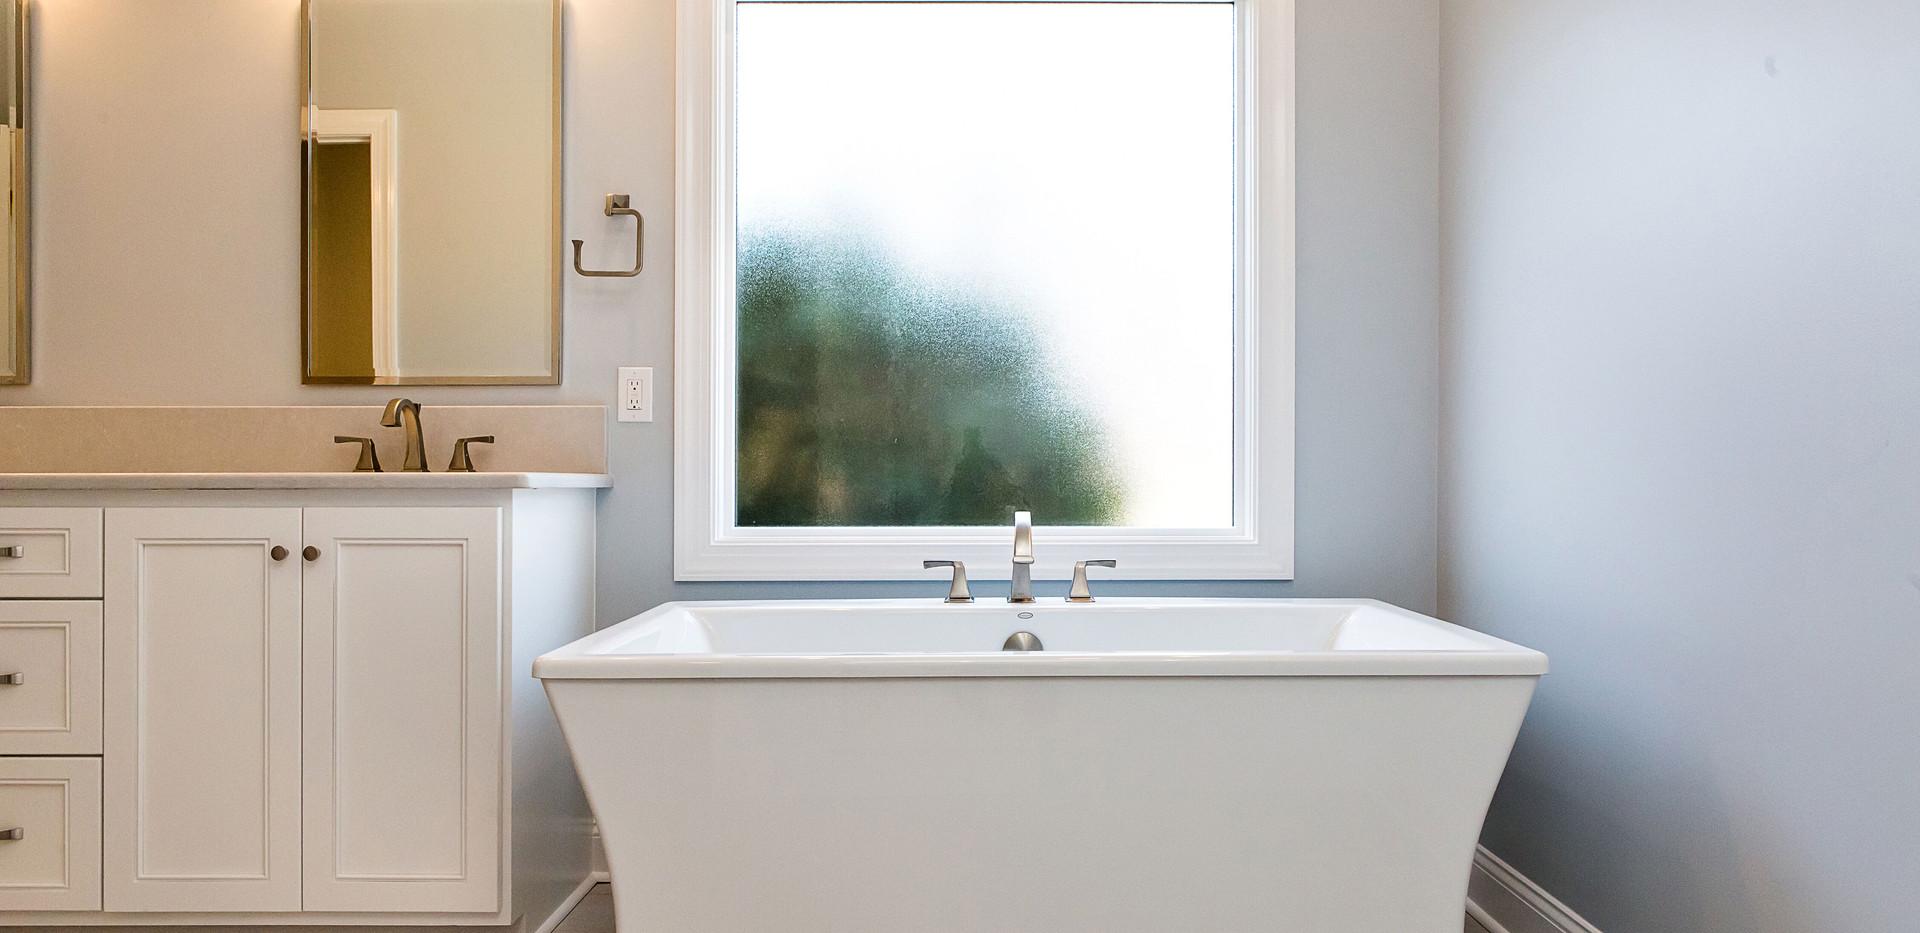 Freestanding tub